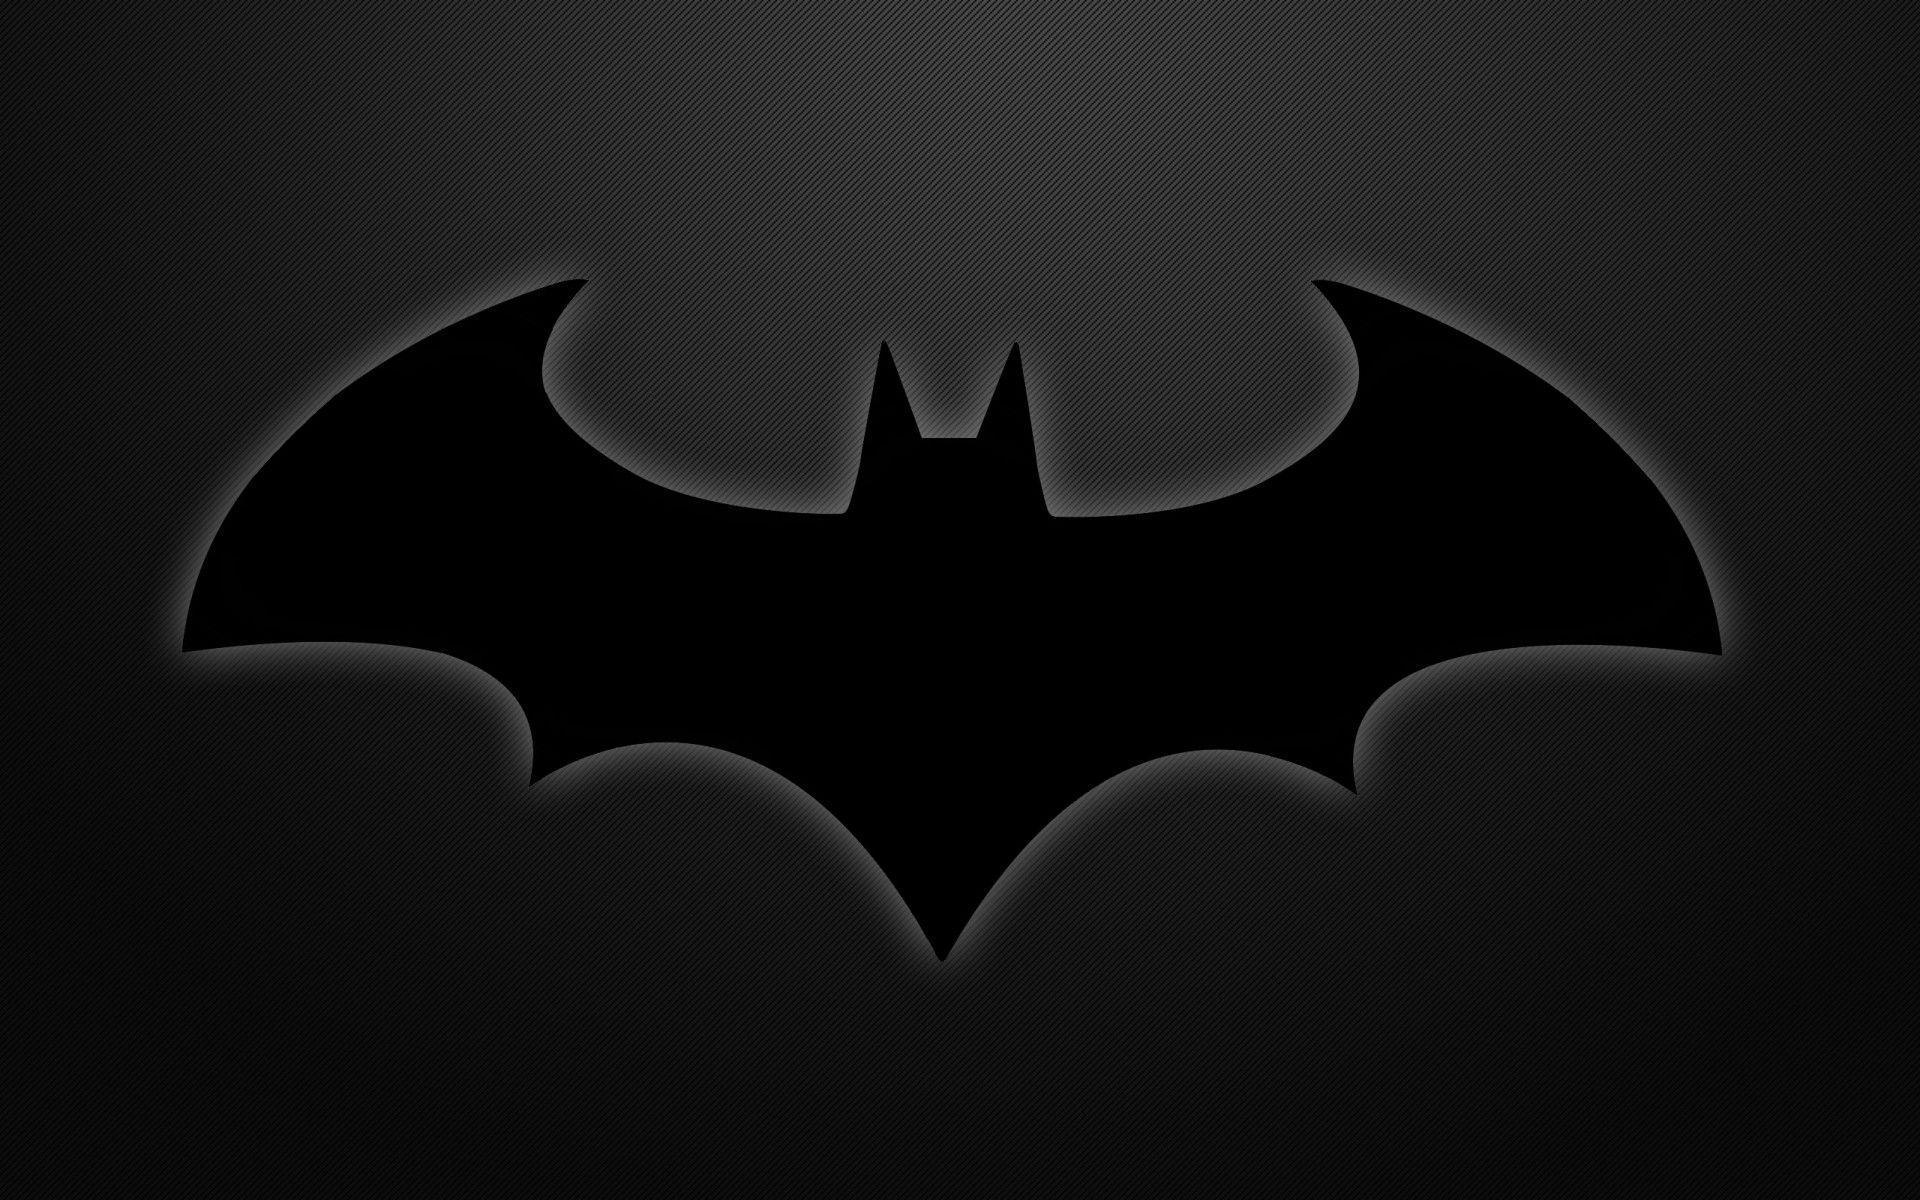 Batman logo wallpapers wallpaper cave wallpapers for batman logo wallpaper android voltagebd Image collections